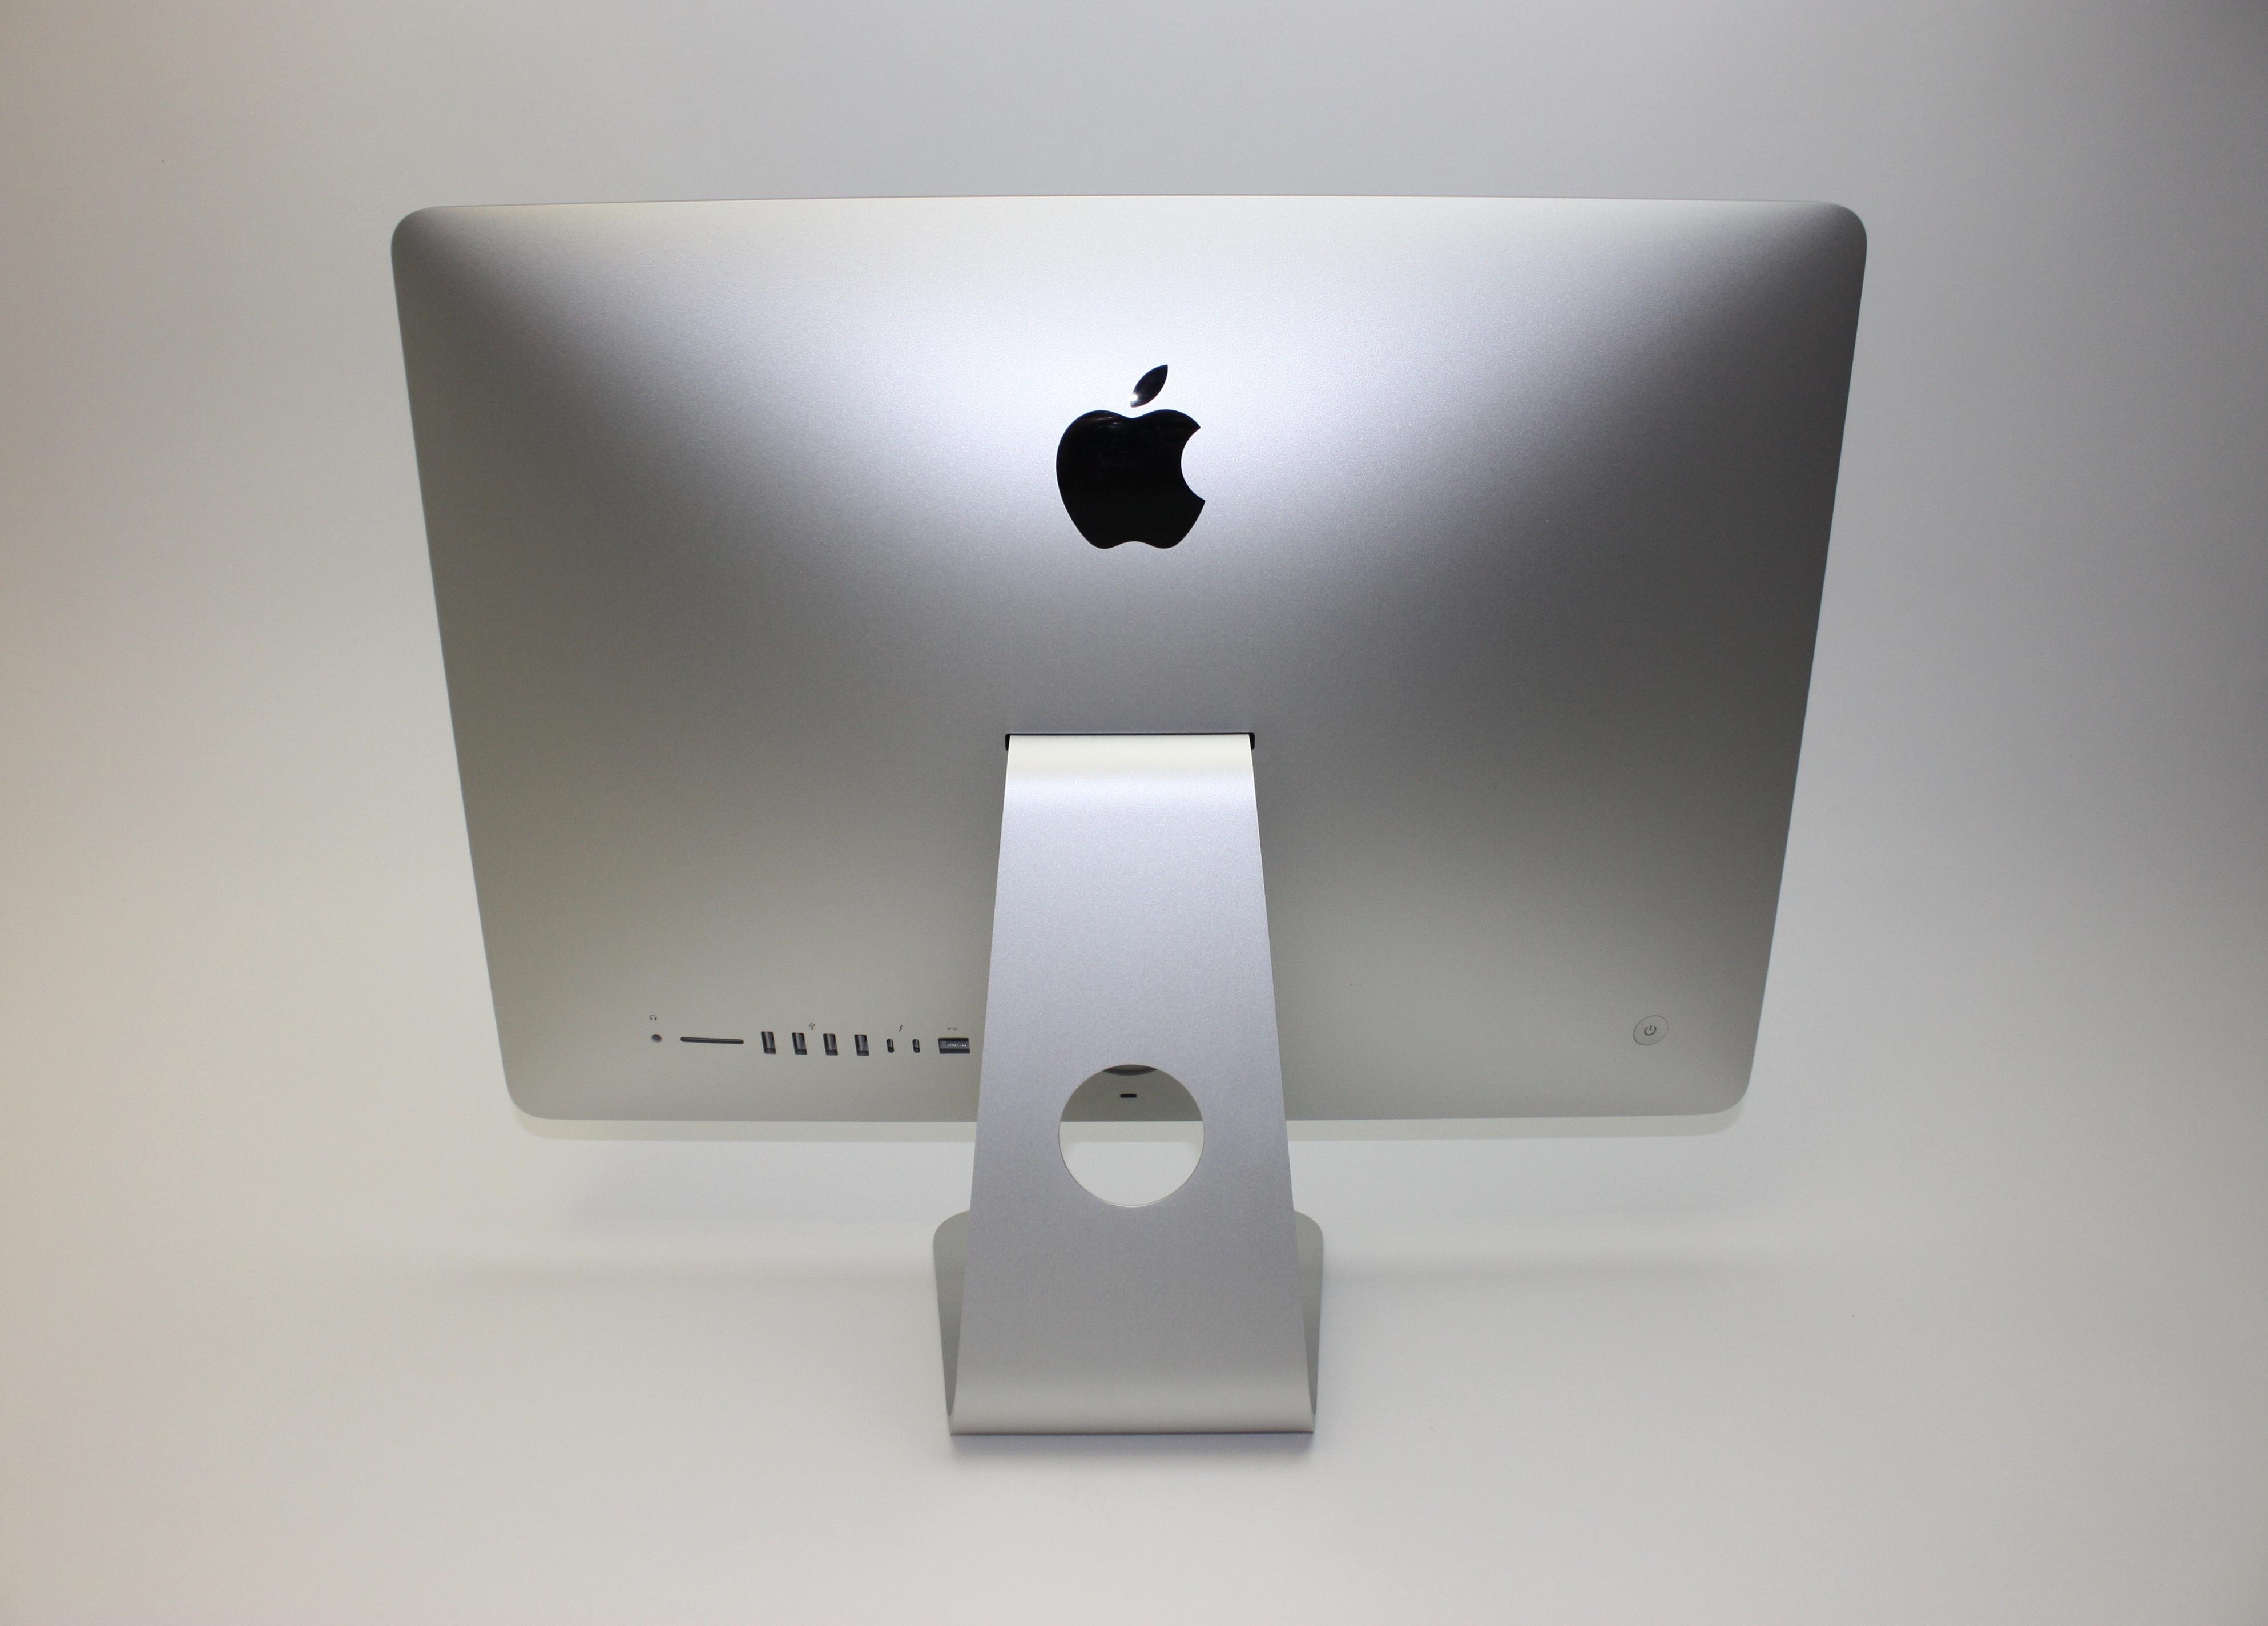 iMac Retina 4K 21.5-inch, 3.0 GHz Core i5, 8 GB 2400 MHz DDR4, 1 TB SATA Disk, image 5